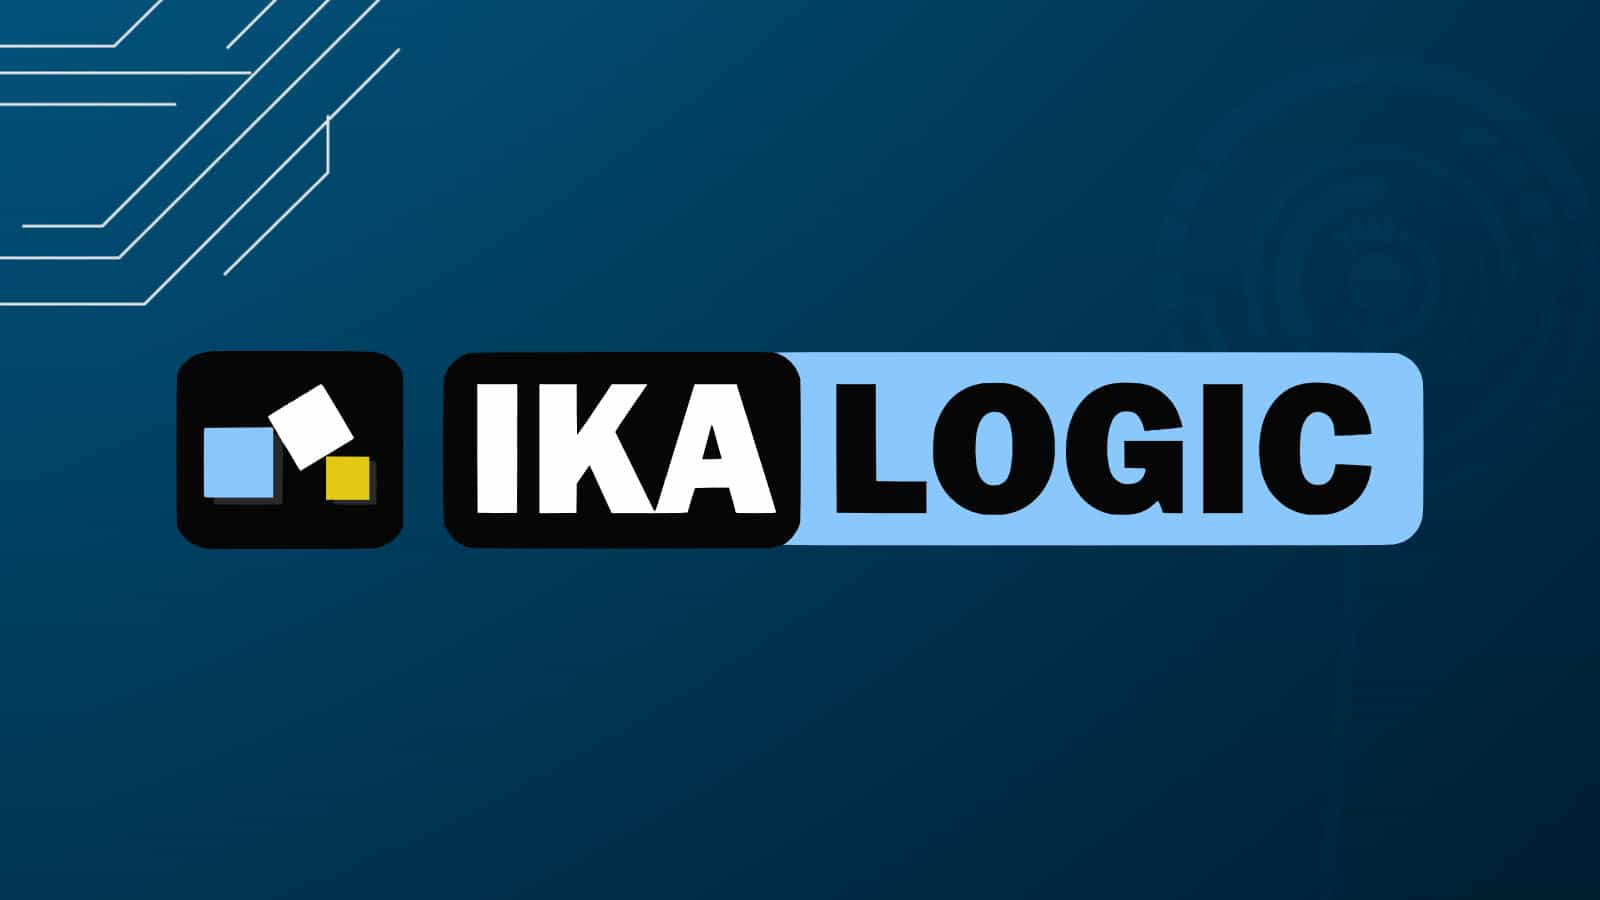 Ikalogic Distribution Agreement